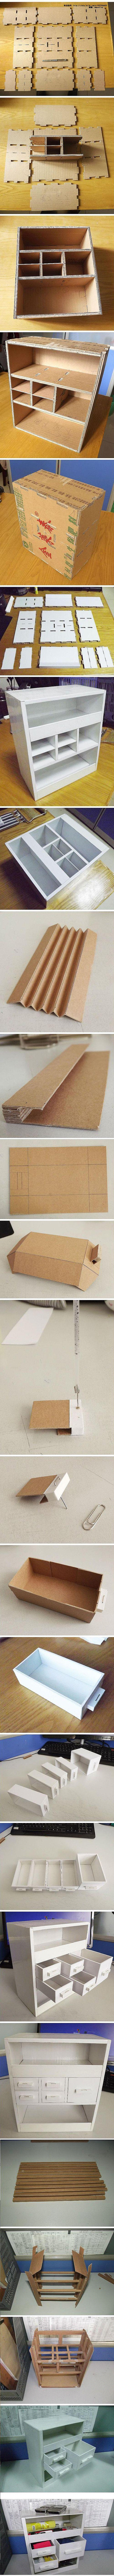 WOW! Box - exquisite handmade DIY